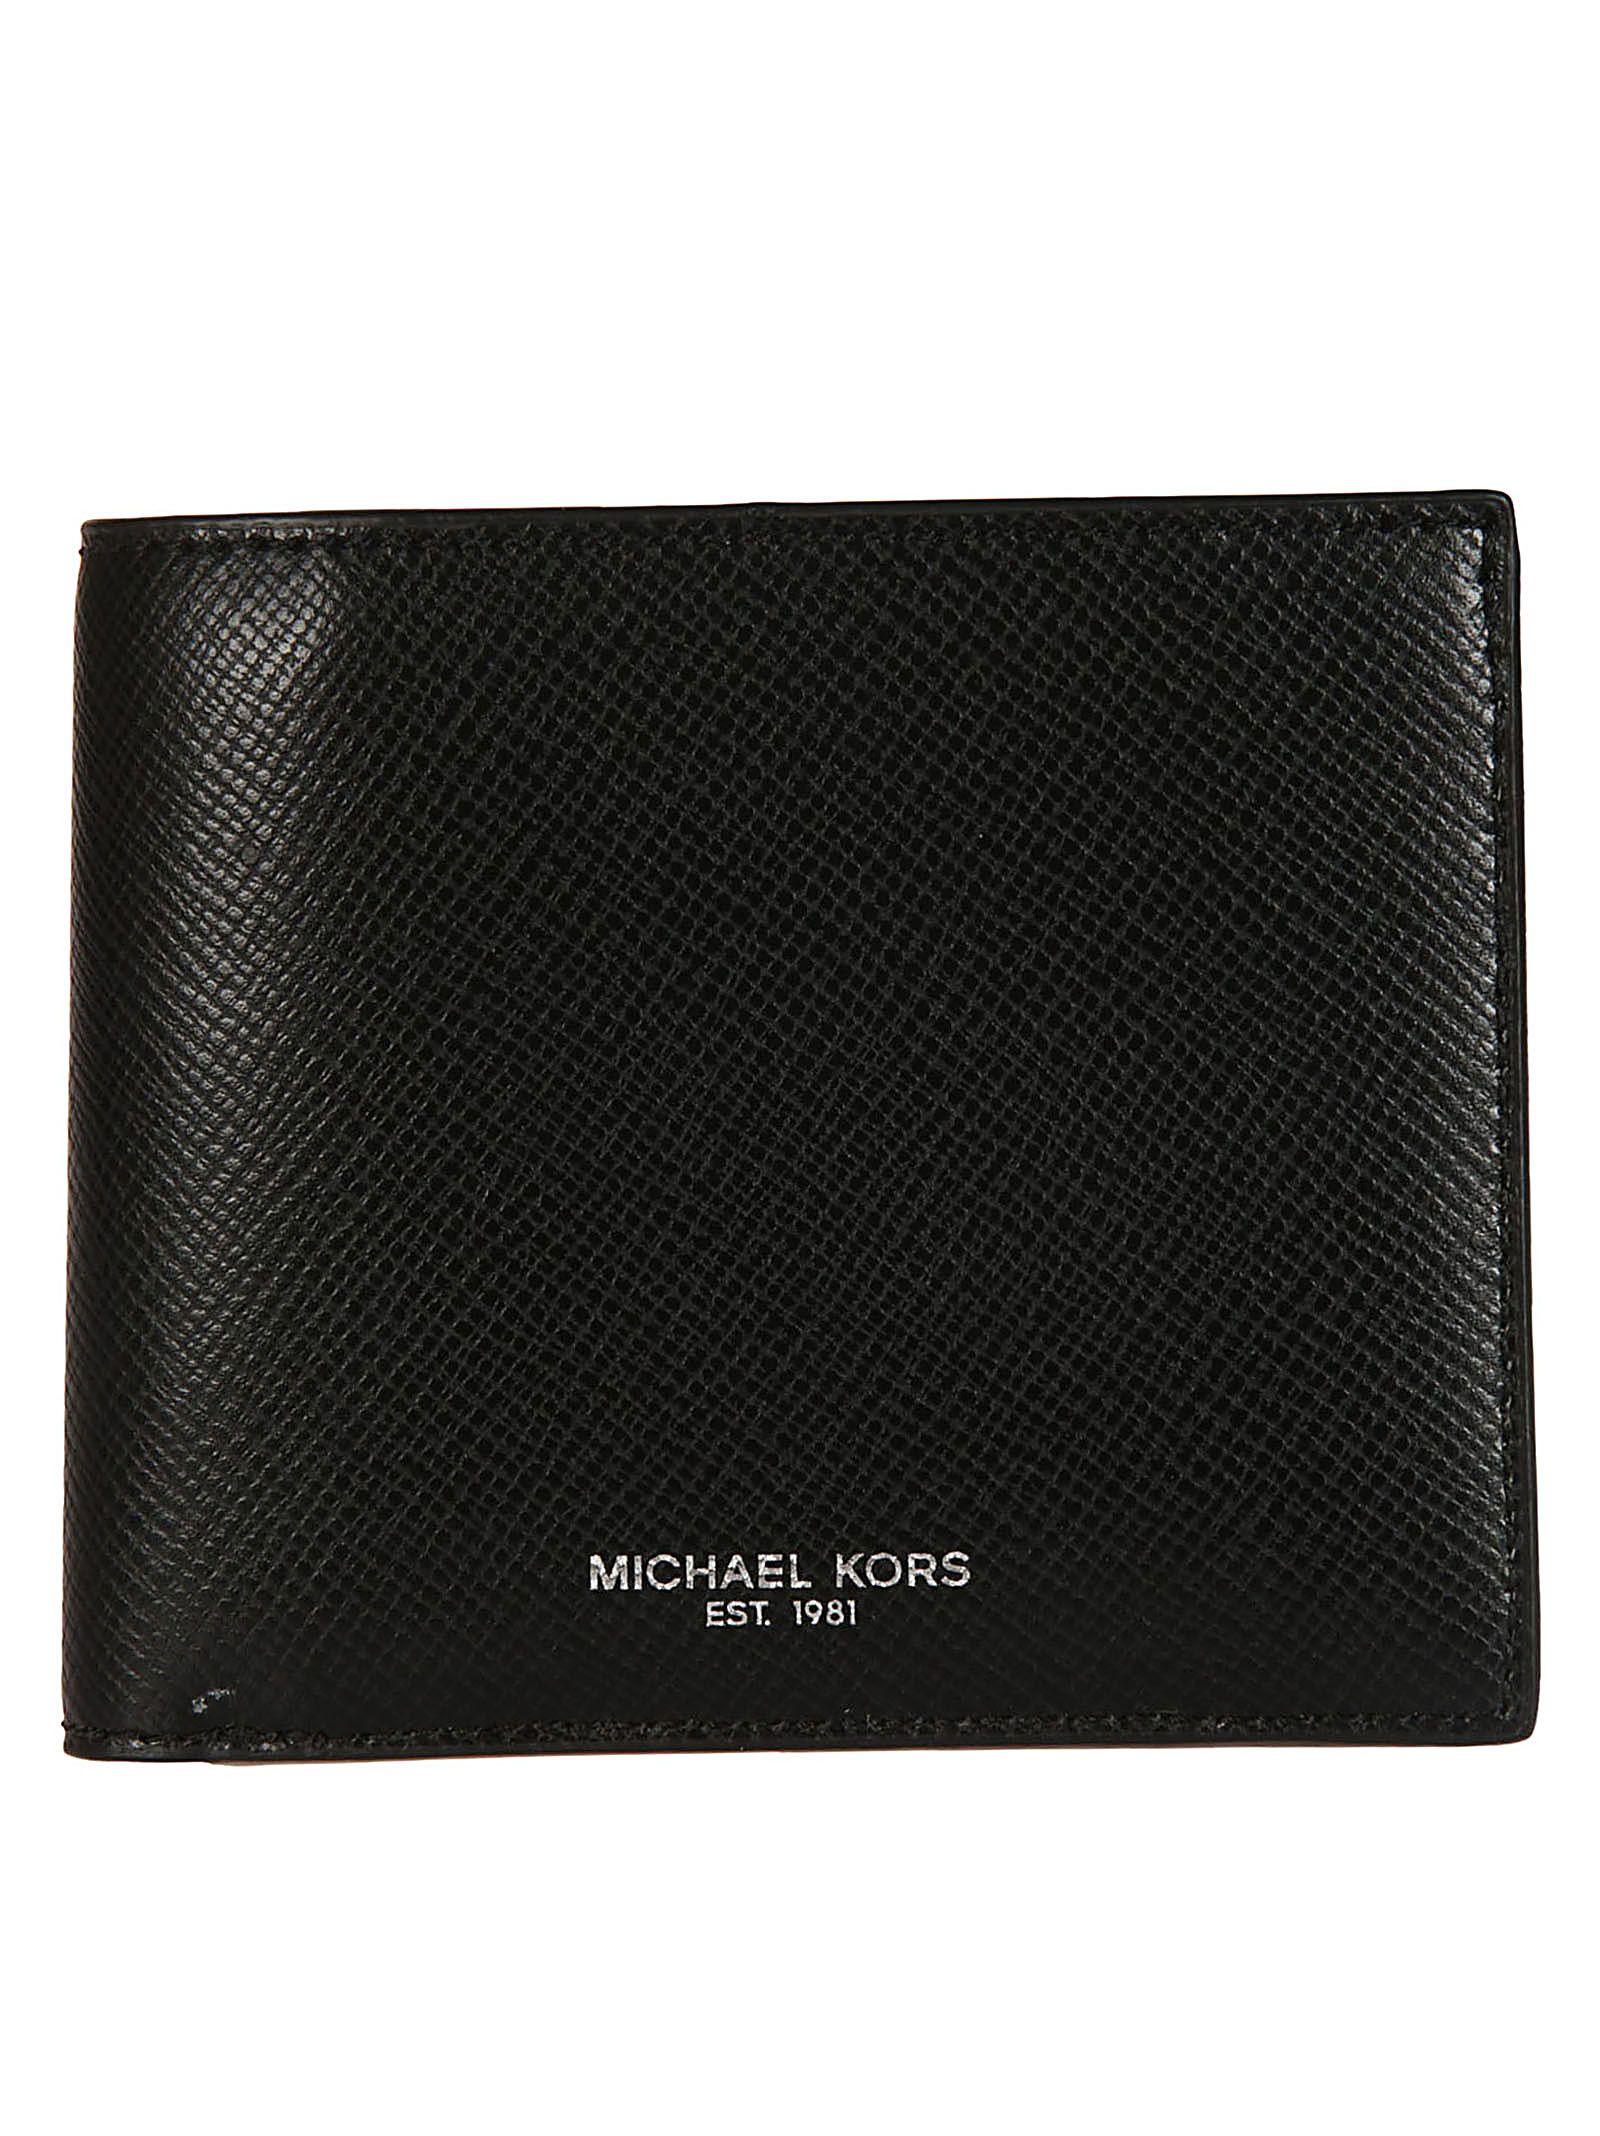 Michael Kors Wallets Michael Kors Classic Billfold Wallet